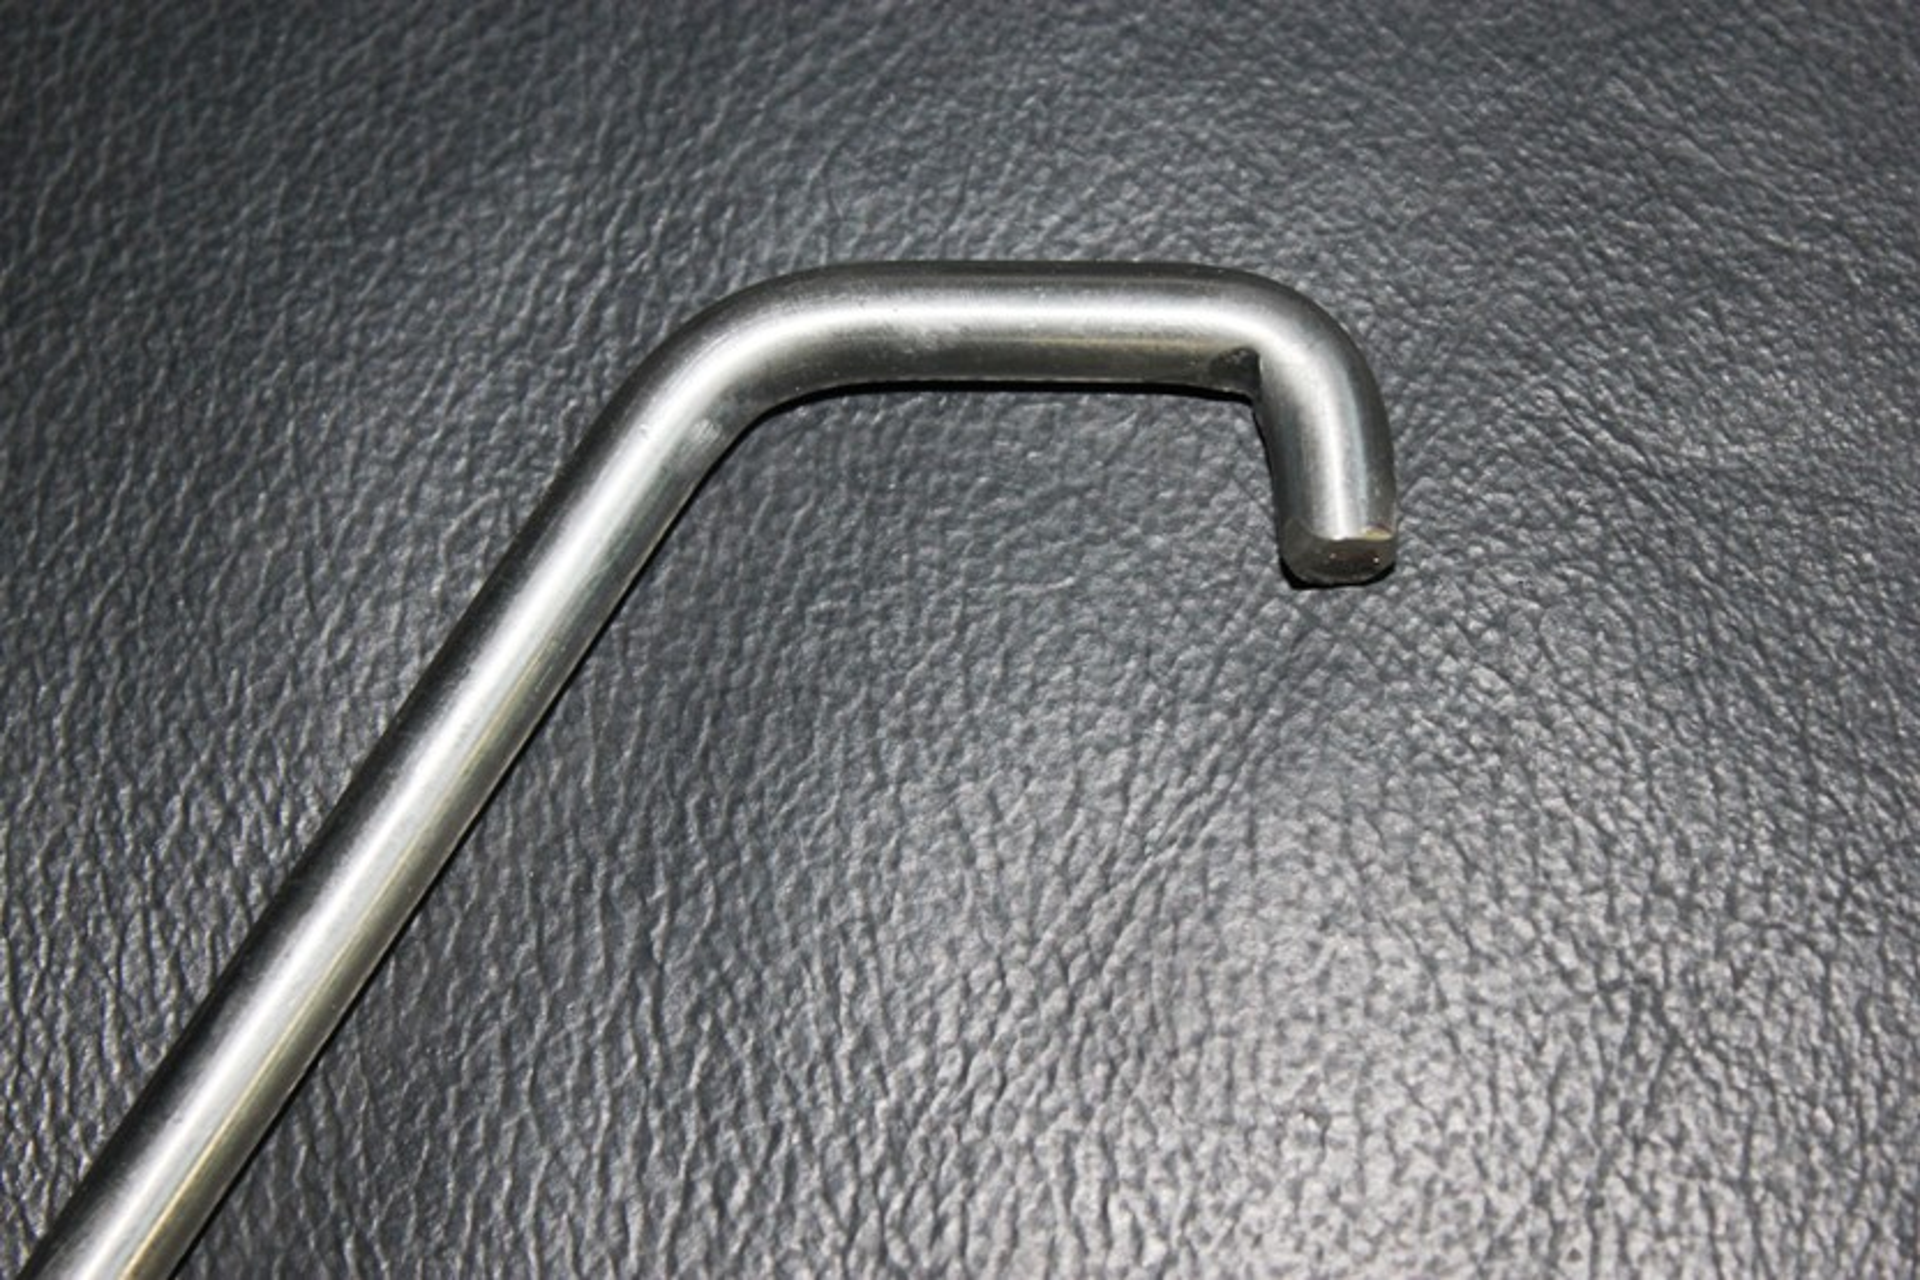 Hanger Mount 10mm Exhaust Stainless Round Bar Bracket